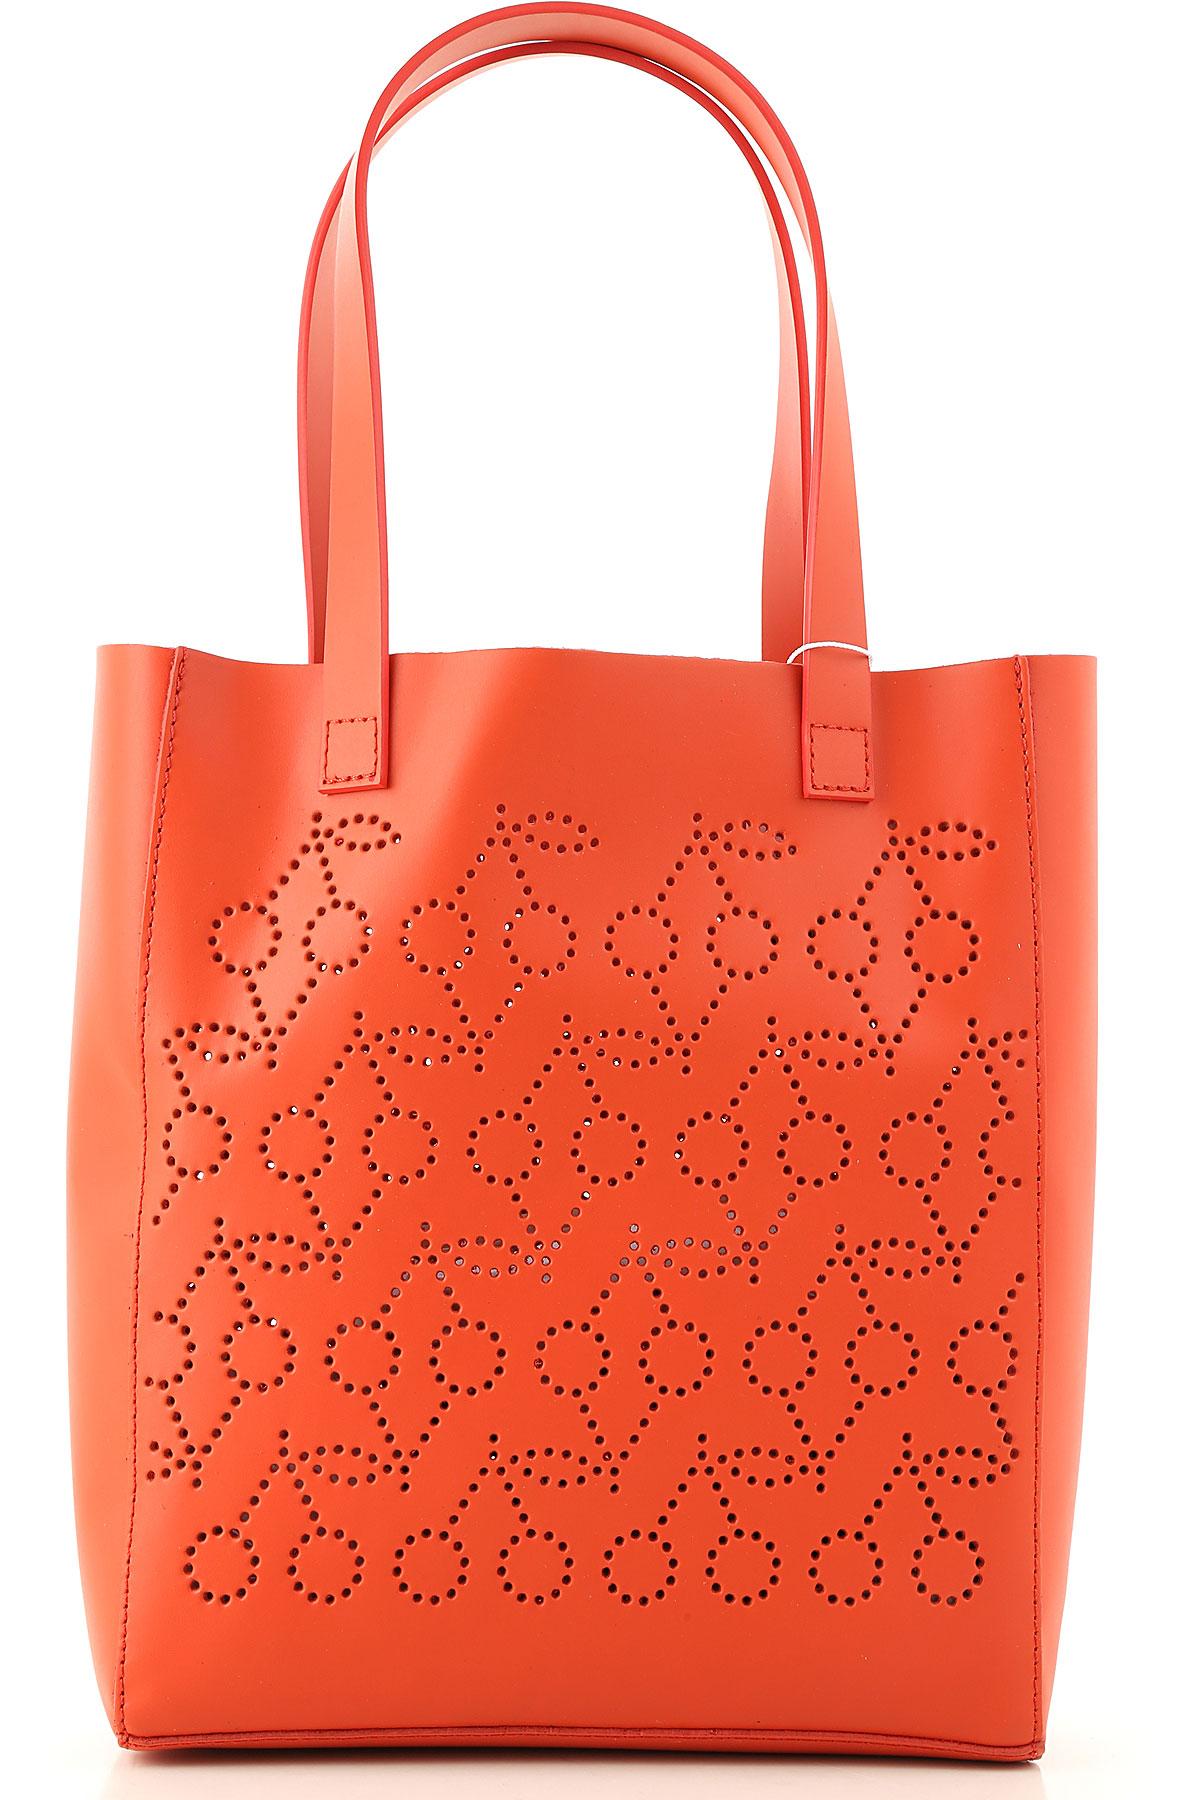 Bonpoint Girls Handbag On Sale, Brick, Cow Leather, 2019